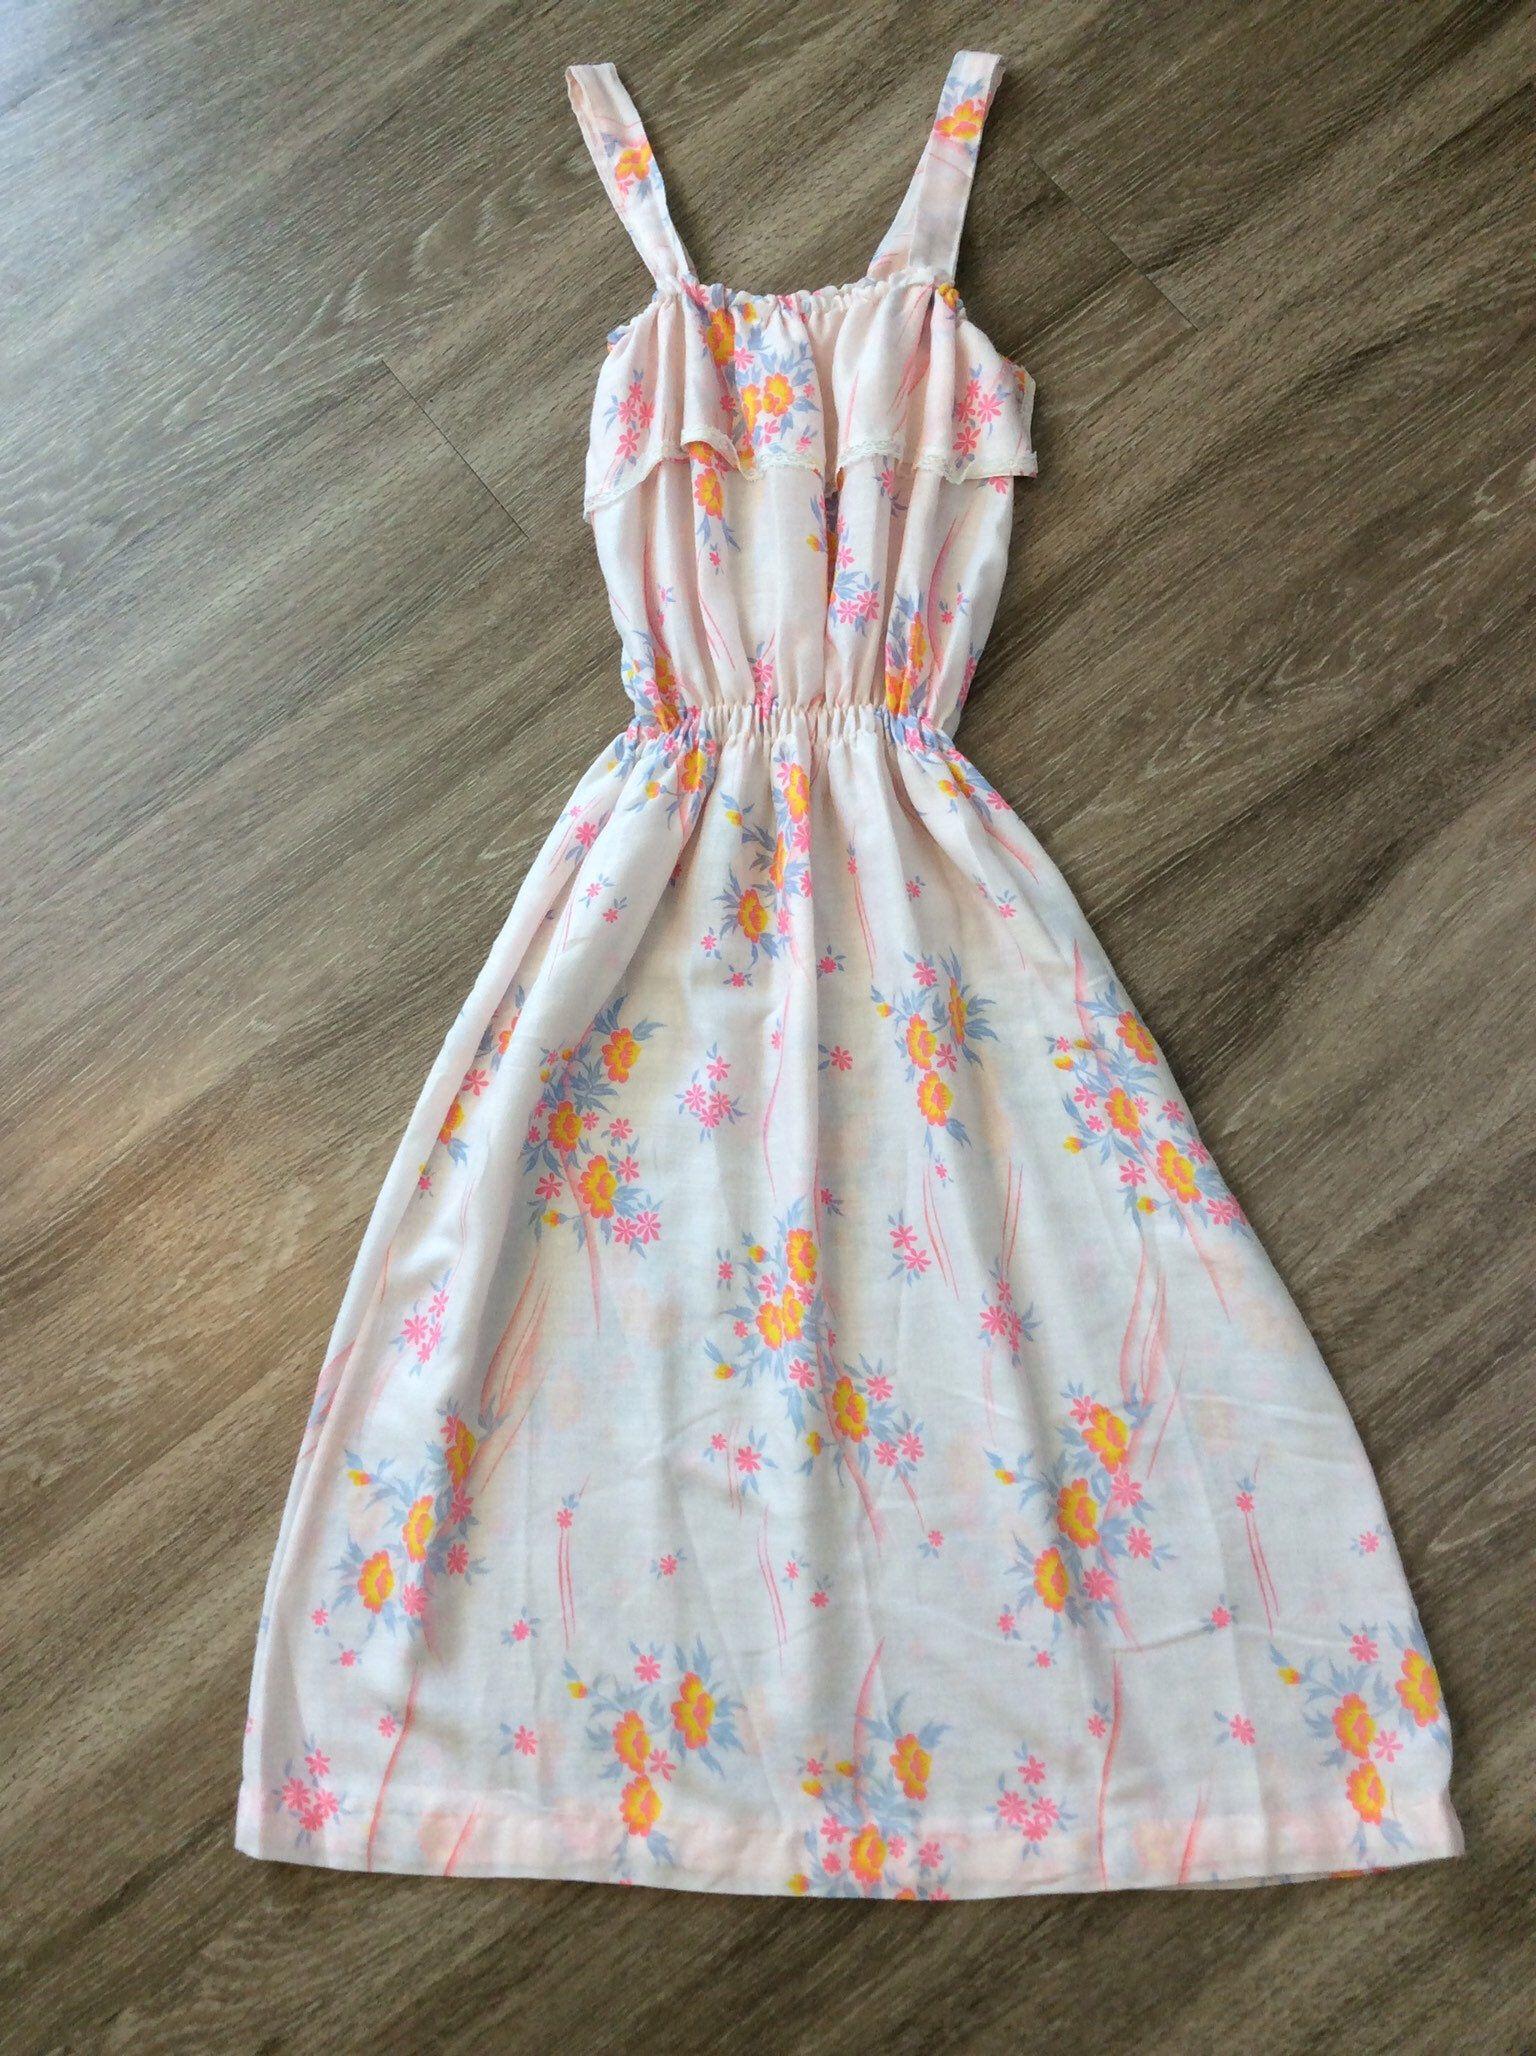 Vintage 70s Handmade Sundress Summer Dress Etsy Summer Dresses Summer Dresses Sundresses Vintage Summer Dresses [ 2056 x 1536 Pixel ]